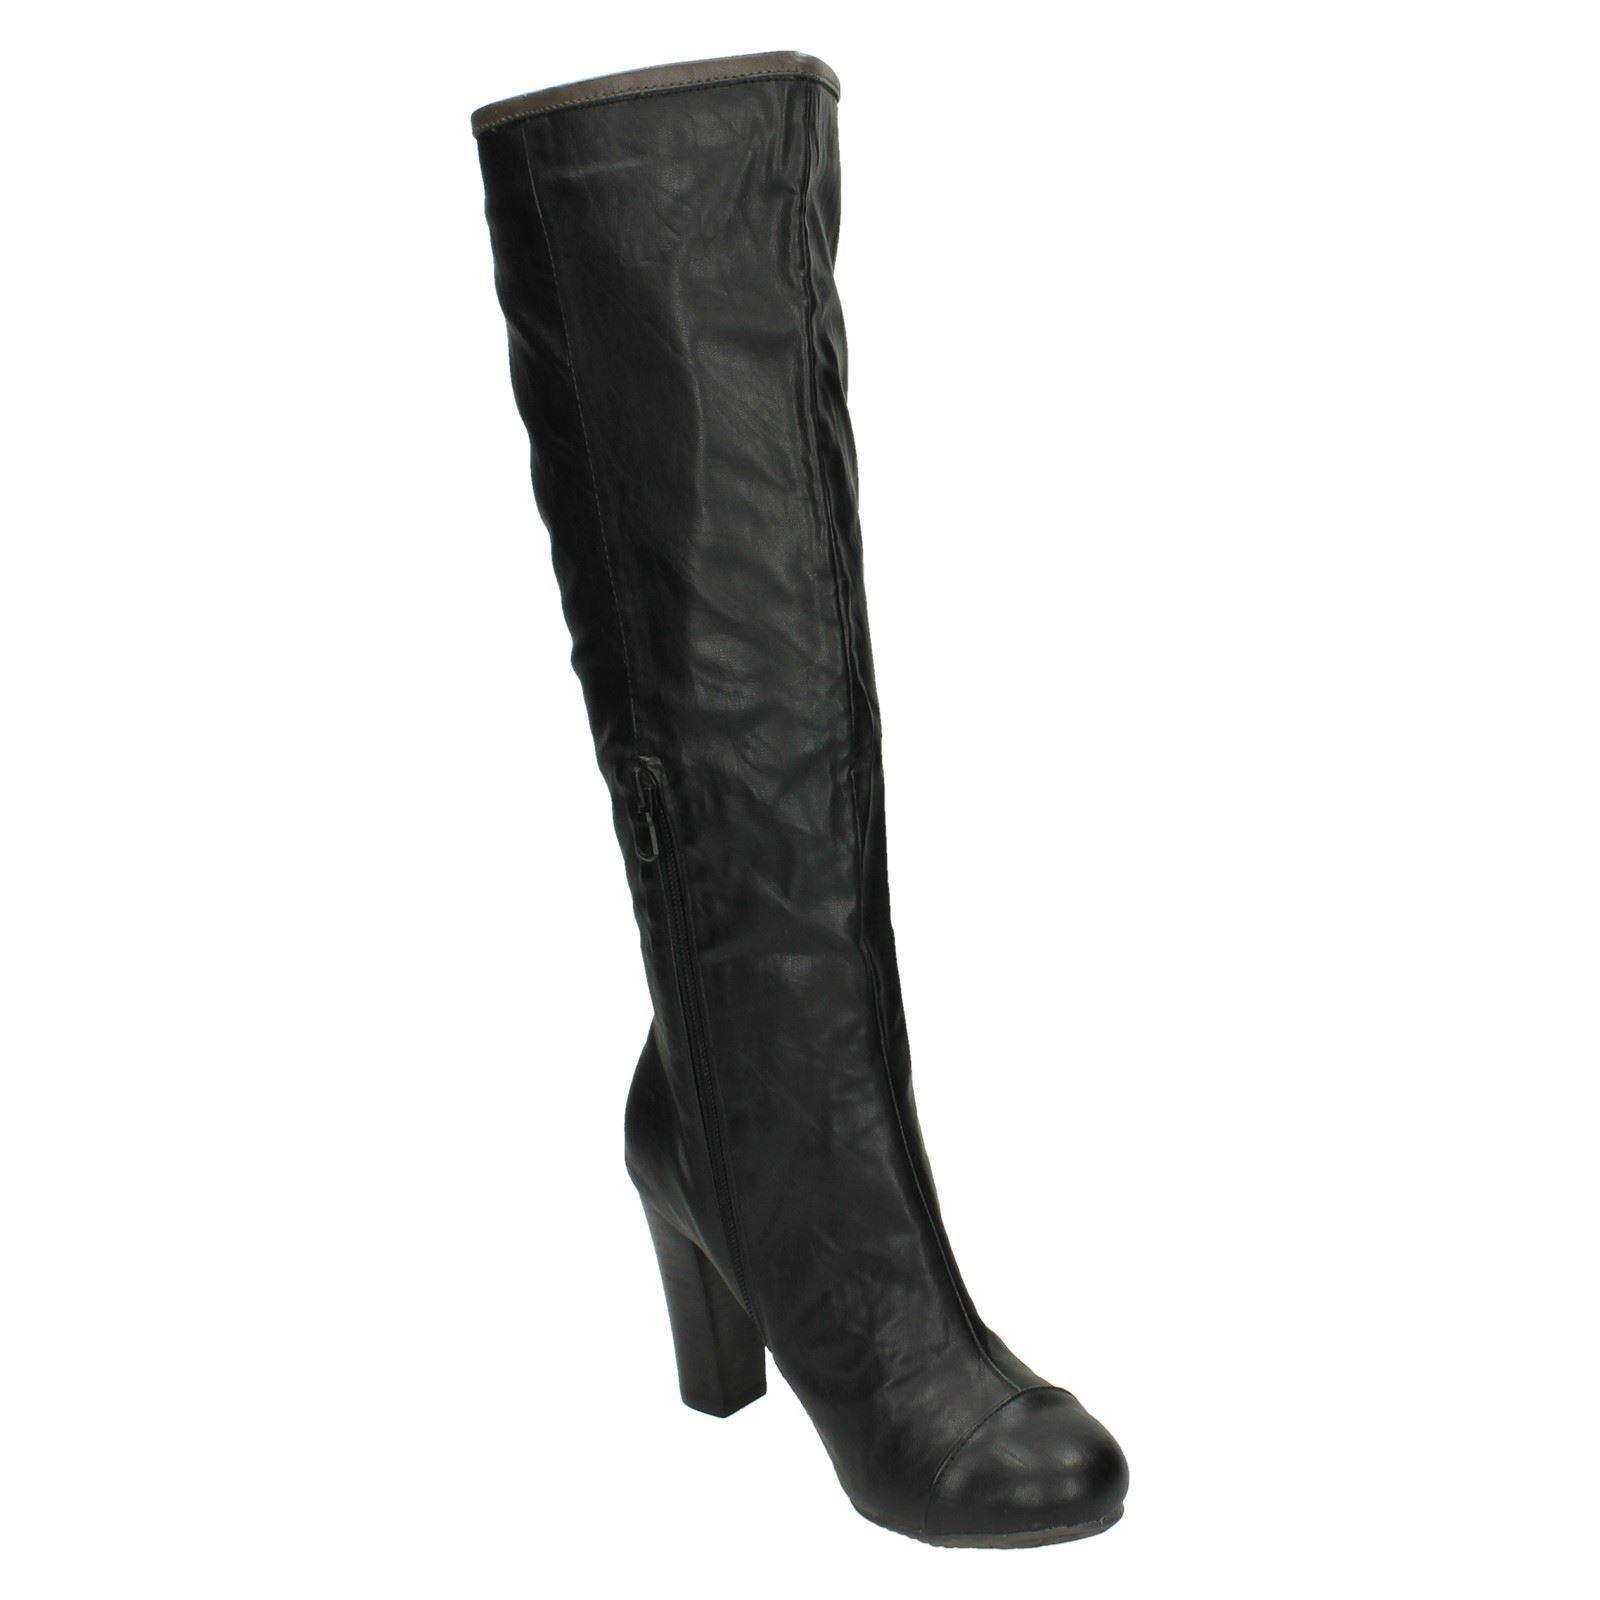 coco high heel knee length boots l9326 ebay